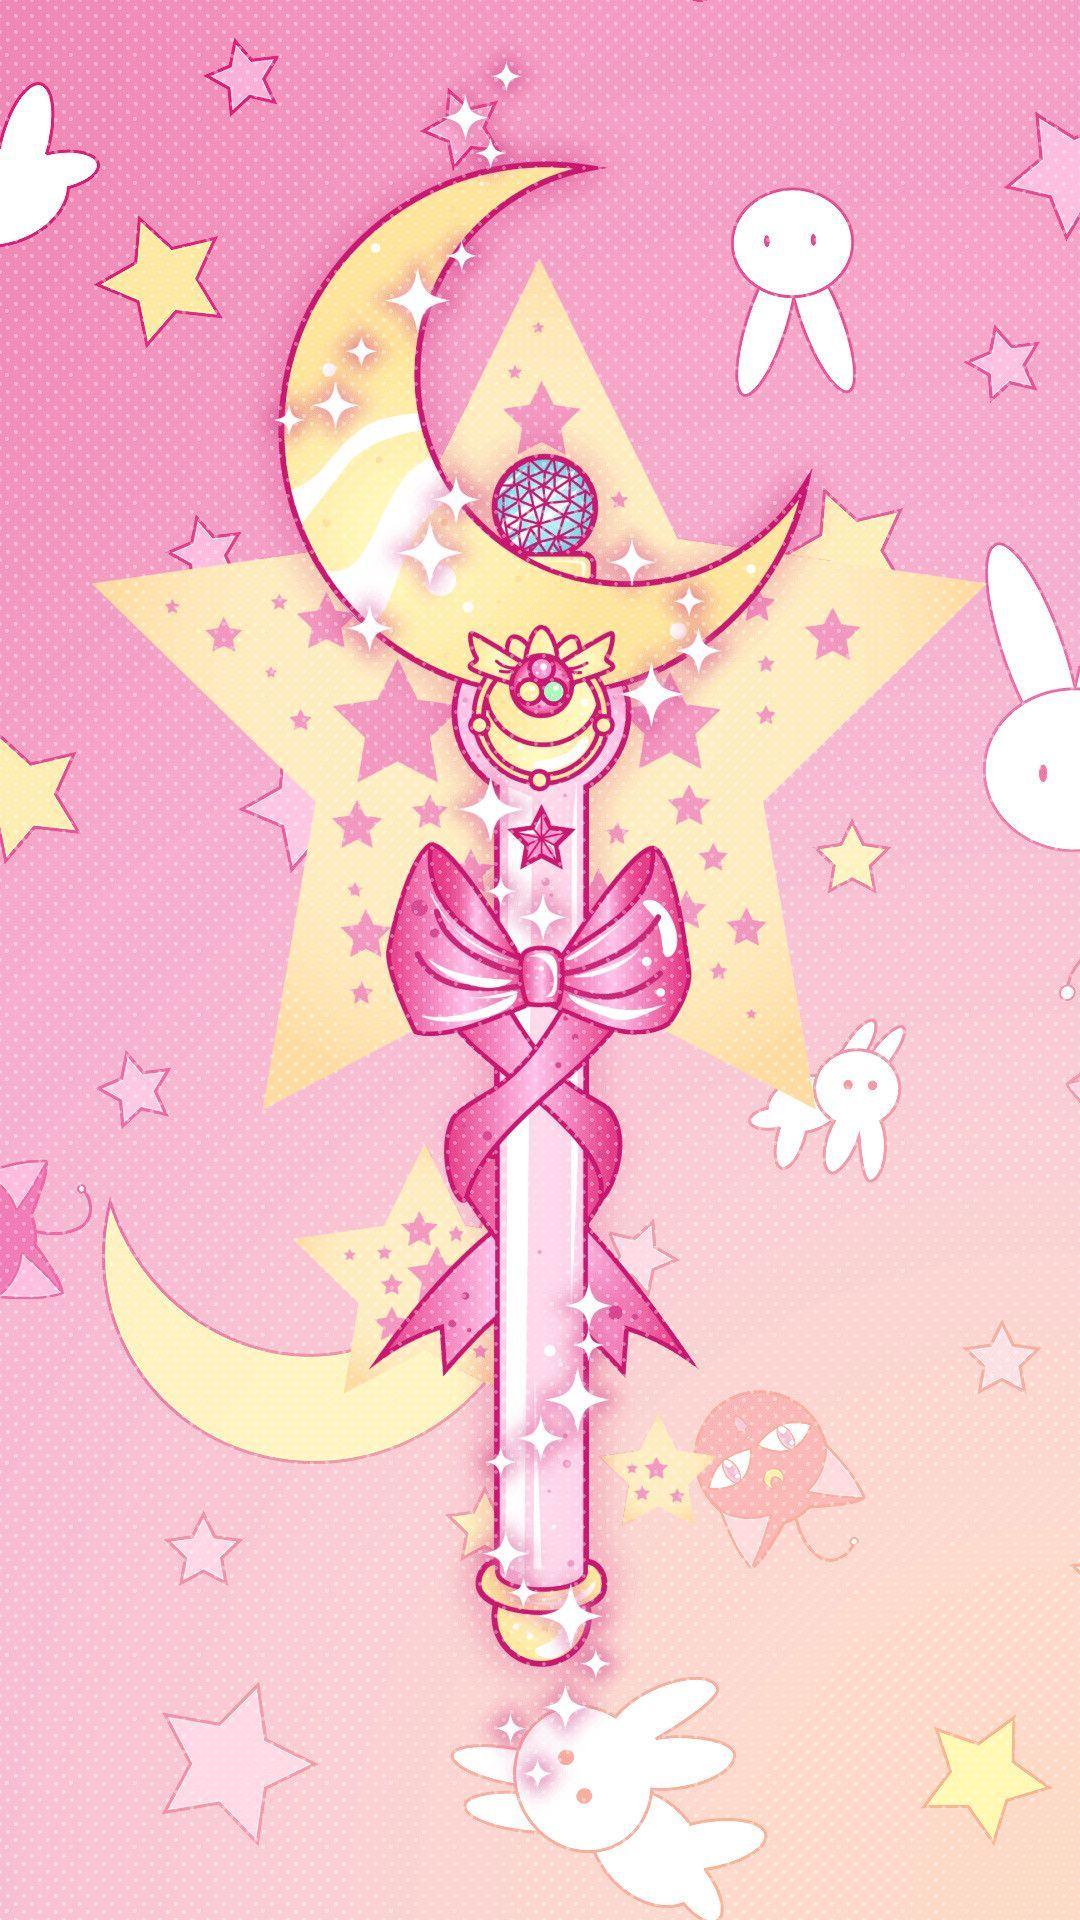 Iphone Sailor Moon Wallpaper 75 Images 620300548659367752 Sailor Moon Wallpaper Sailor Moon Usagi Sailor Moon Fan Art